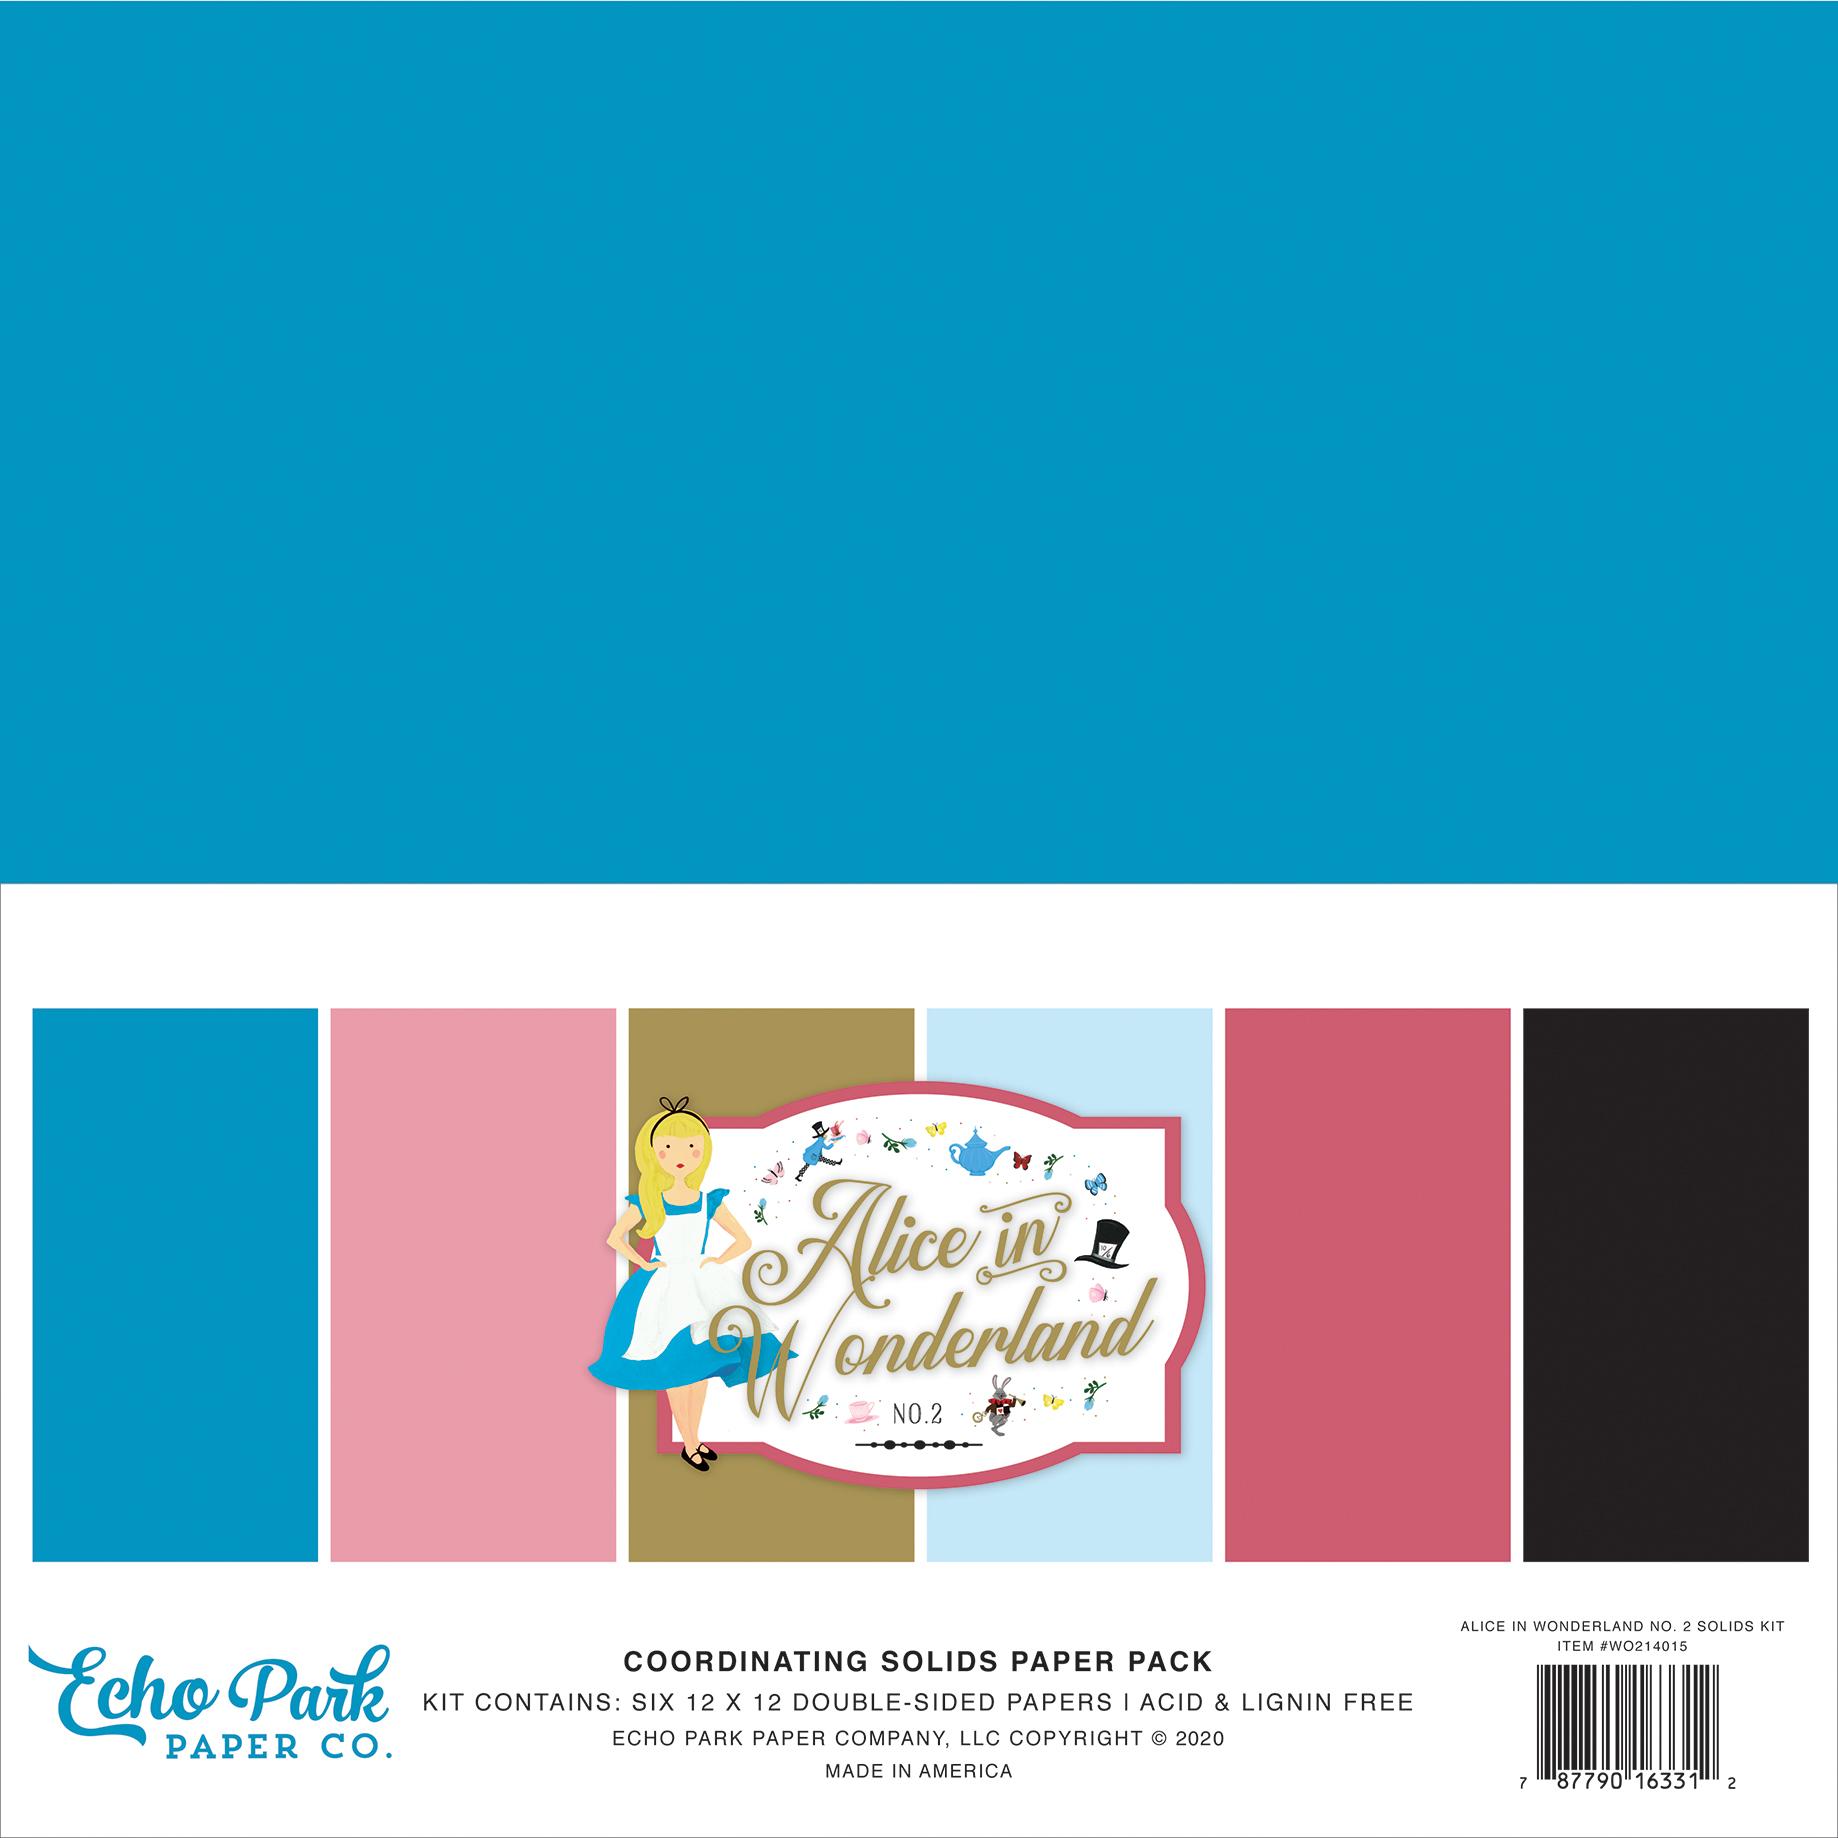 Alice In Wonderland No. 2 Solids Kit